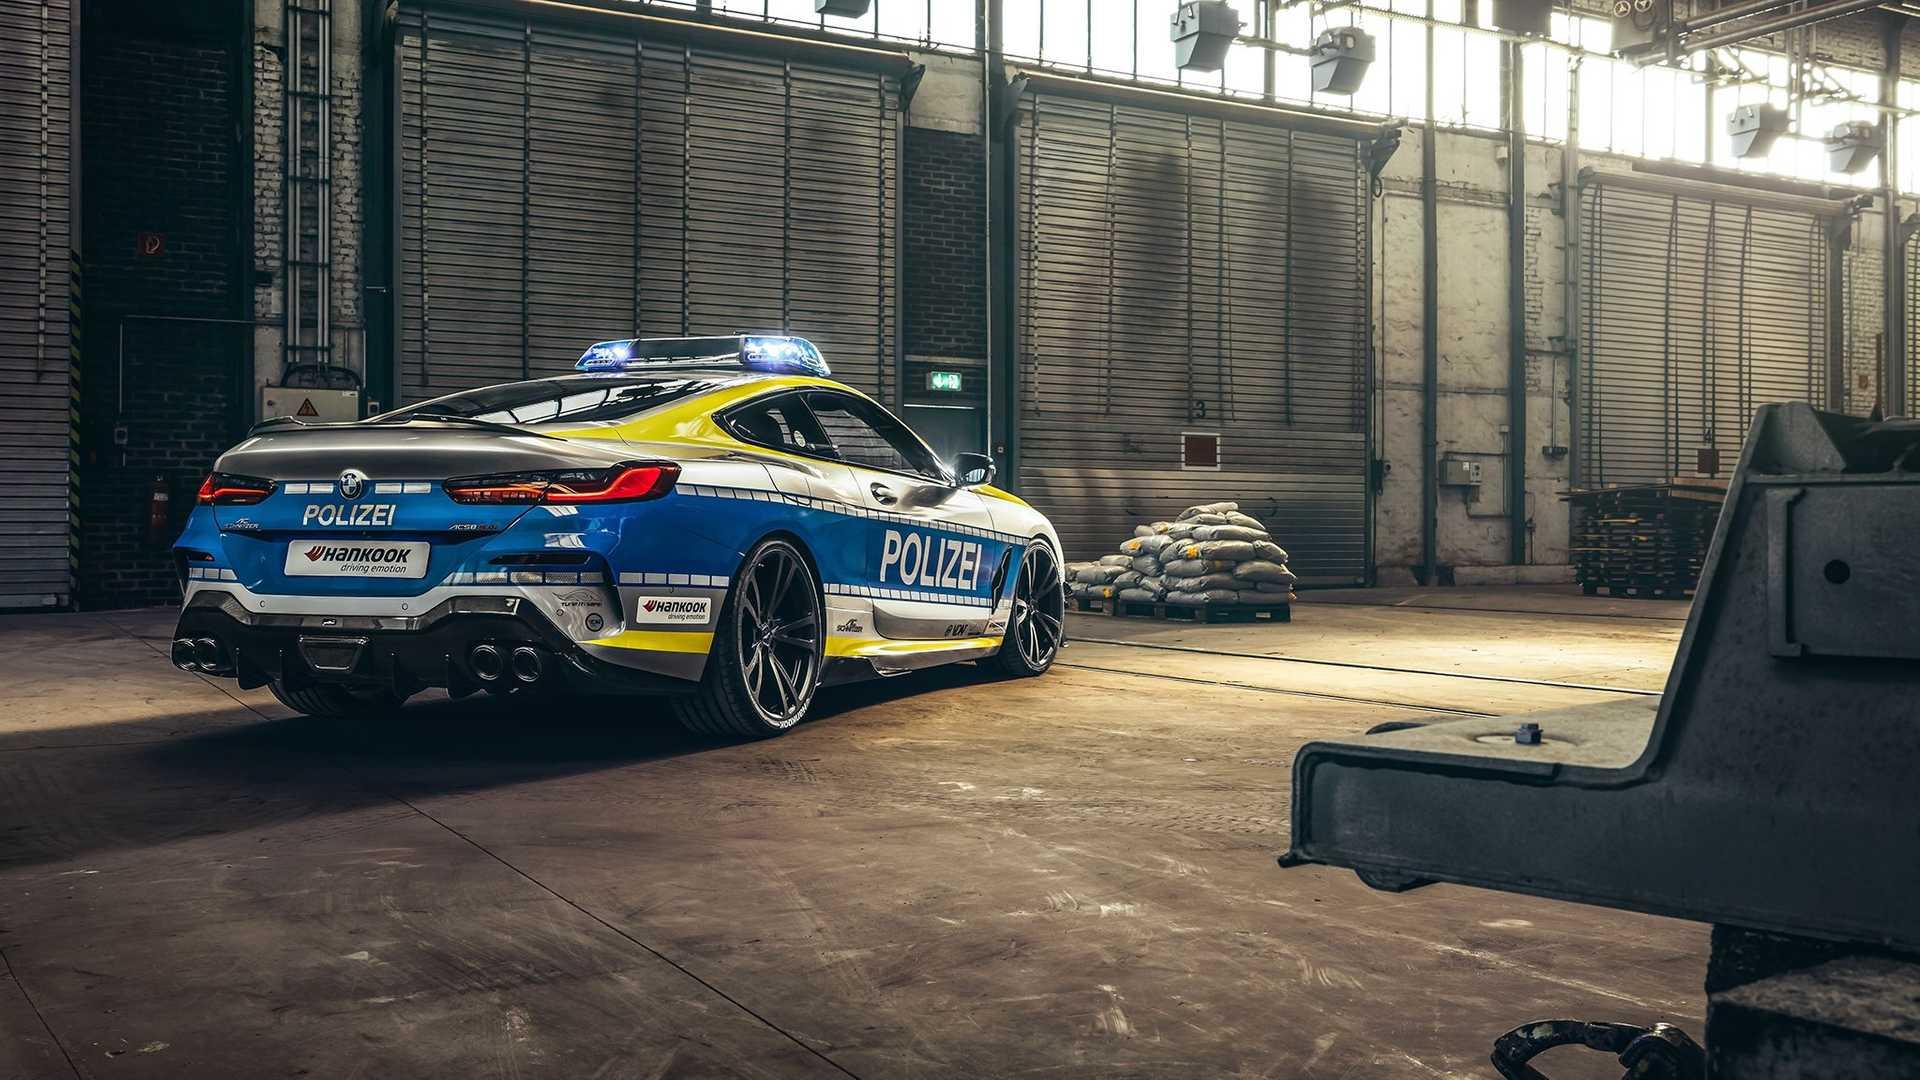 BMW-M850i-police-car-tune-it-safe-30